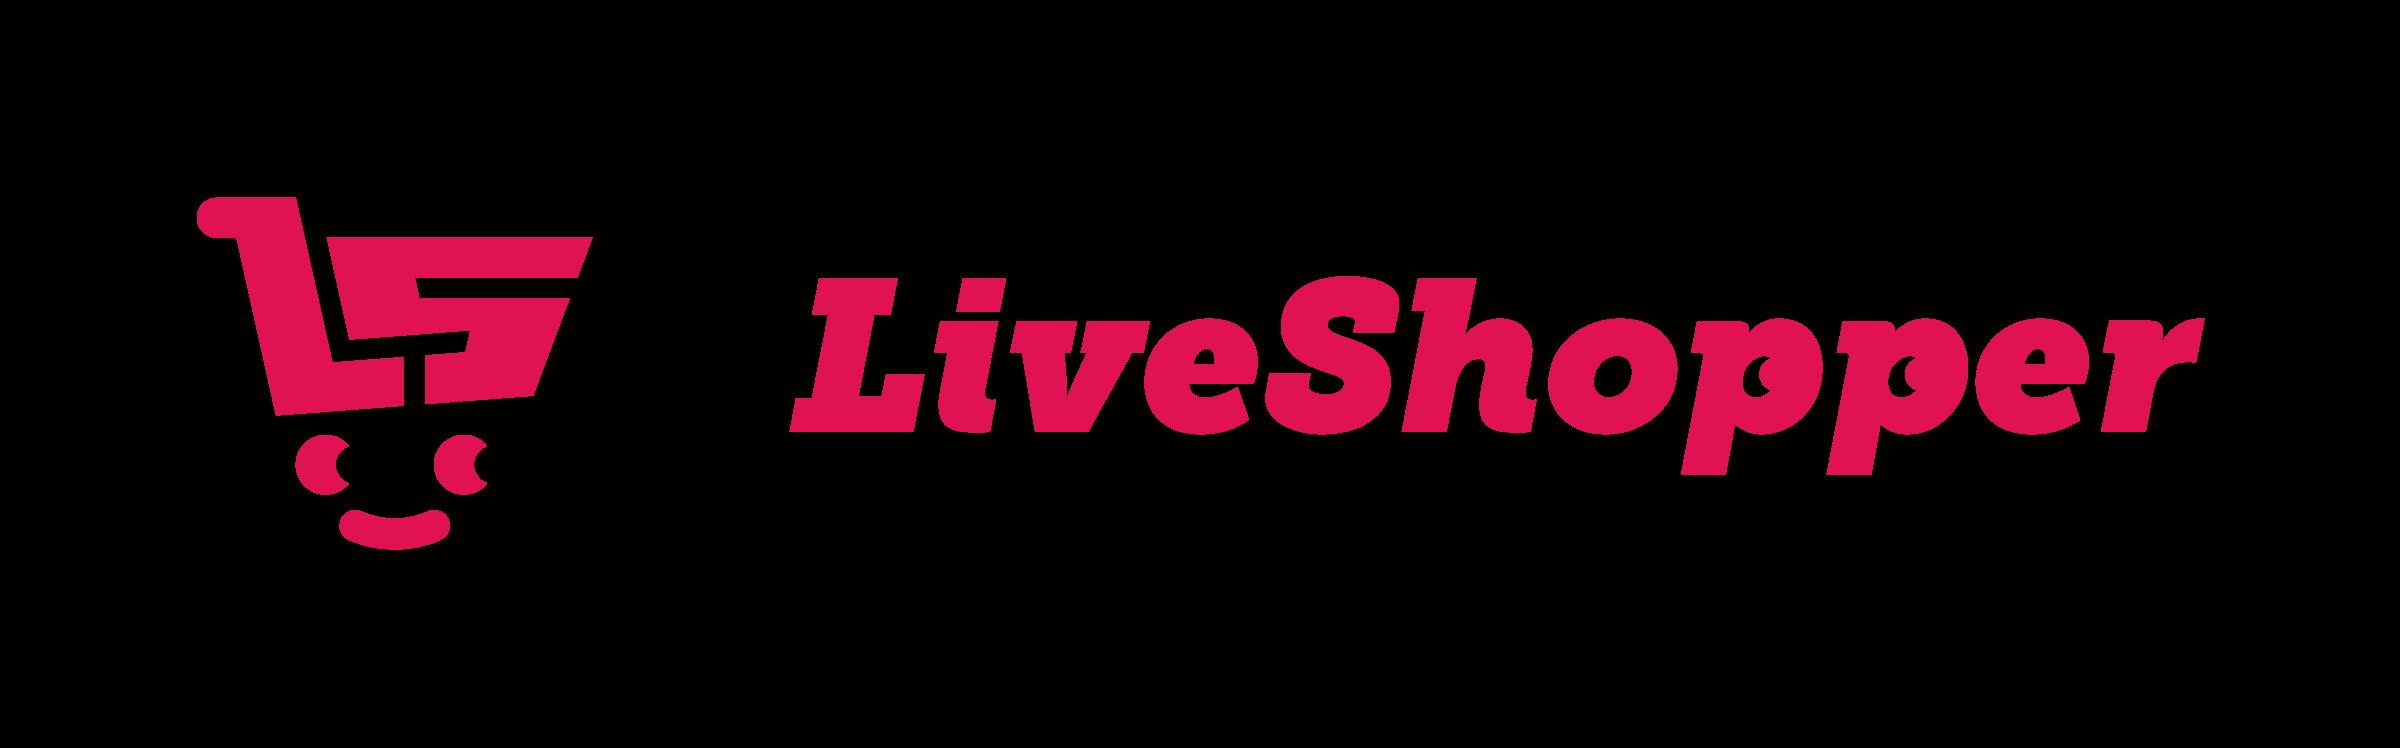 LIVESHOPPER_LOCKUP_COLOR_2400X748.png